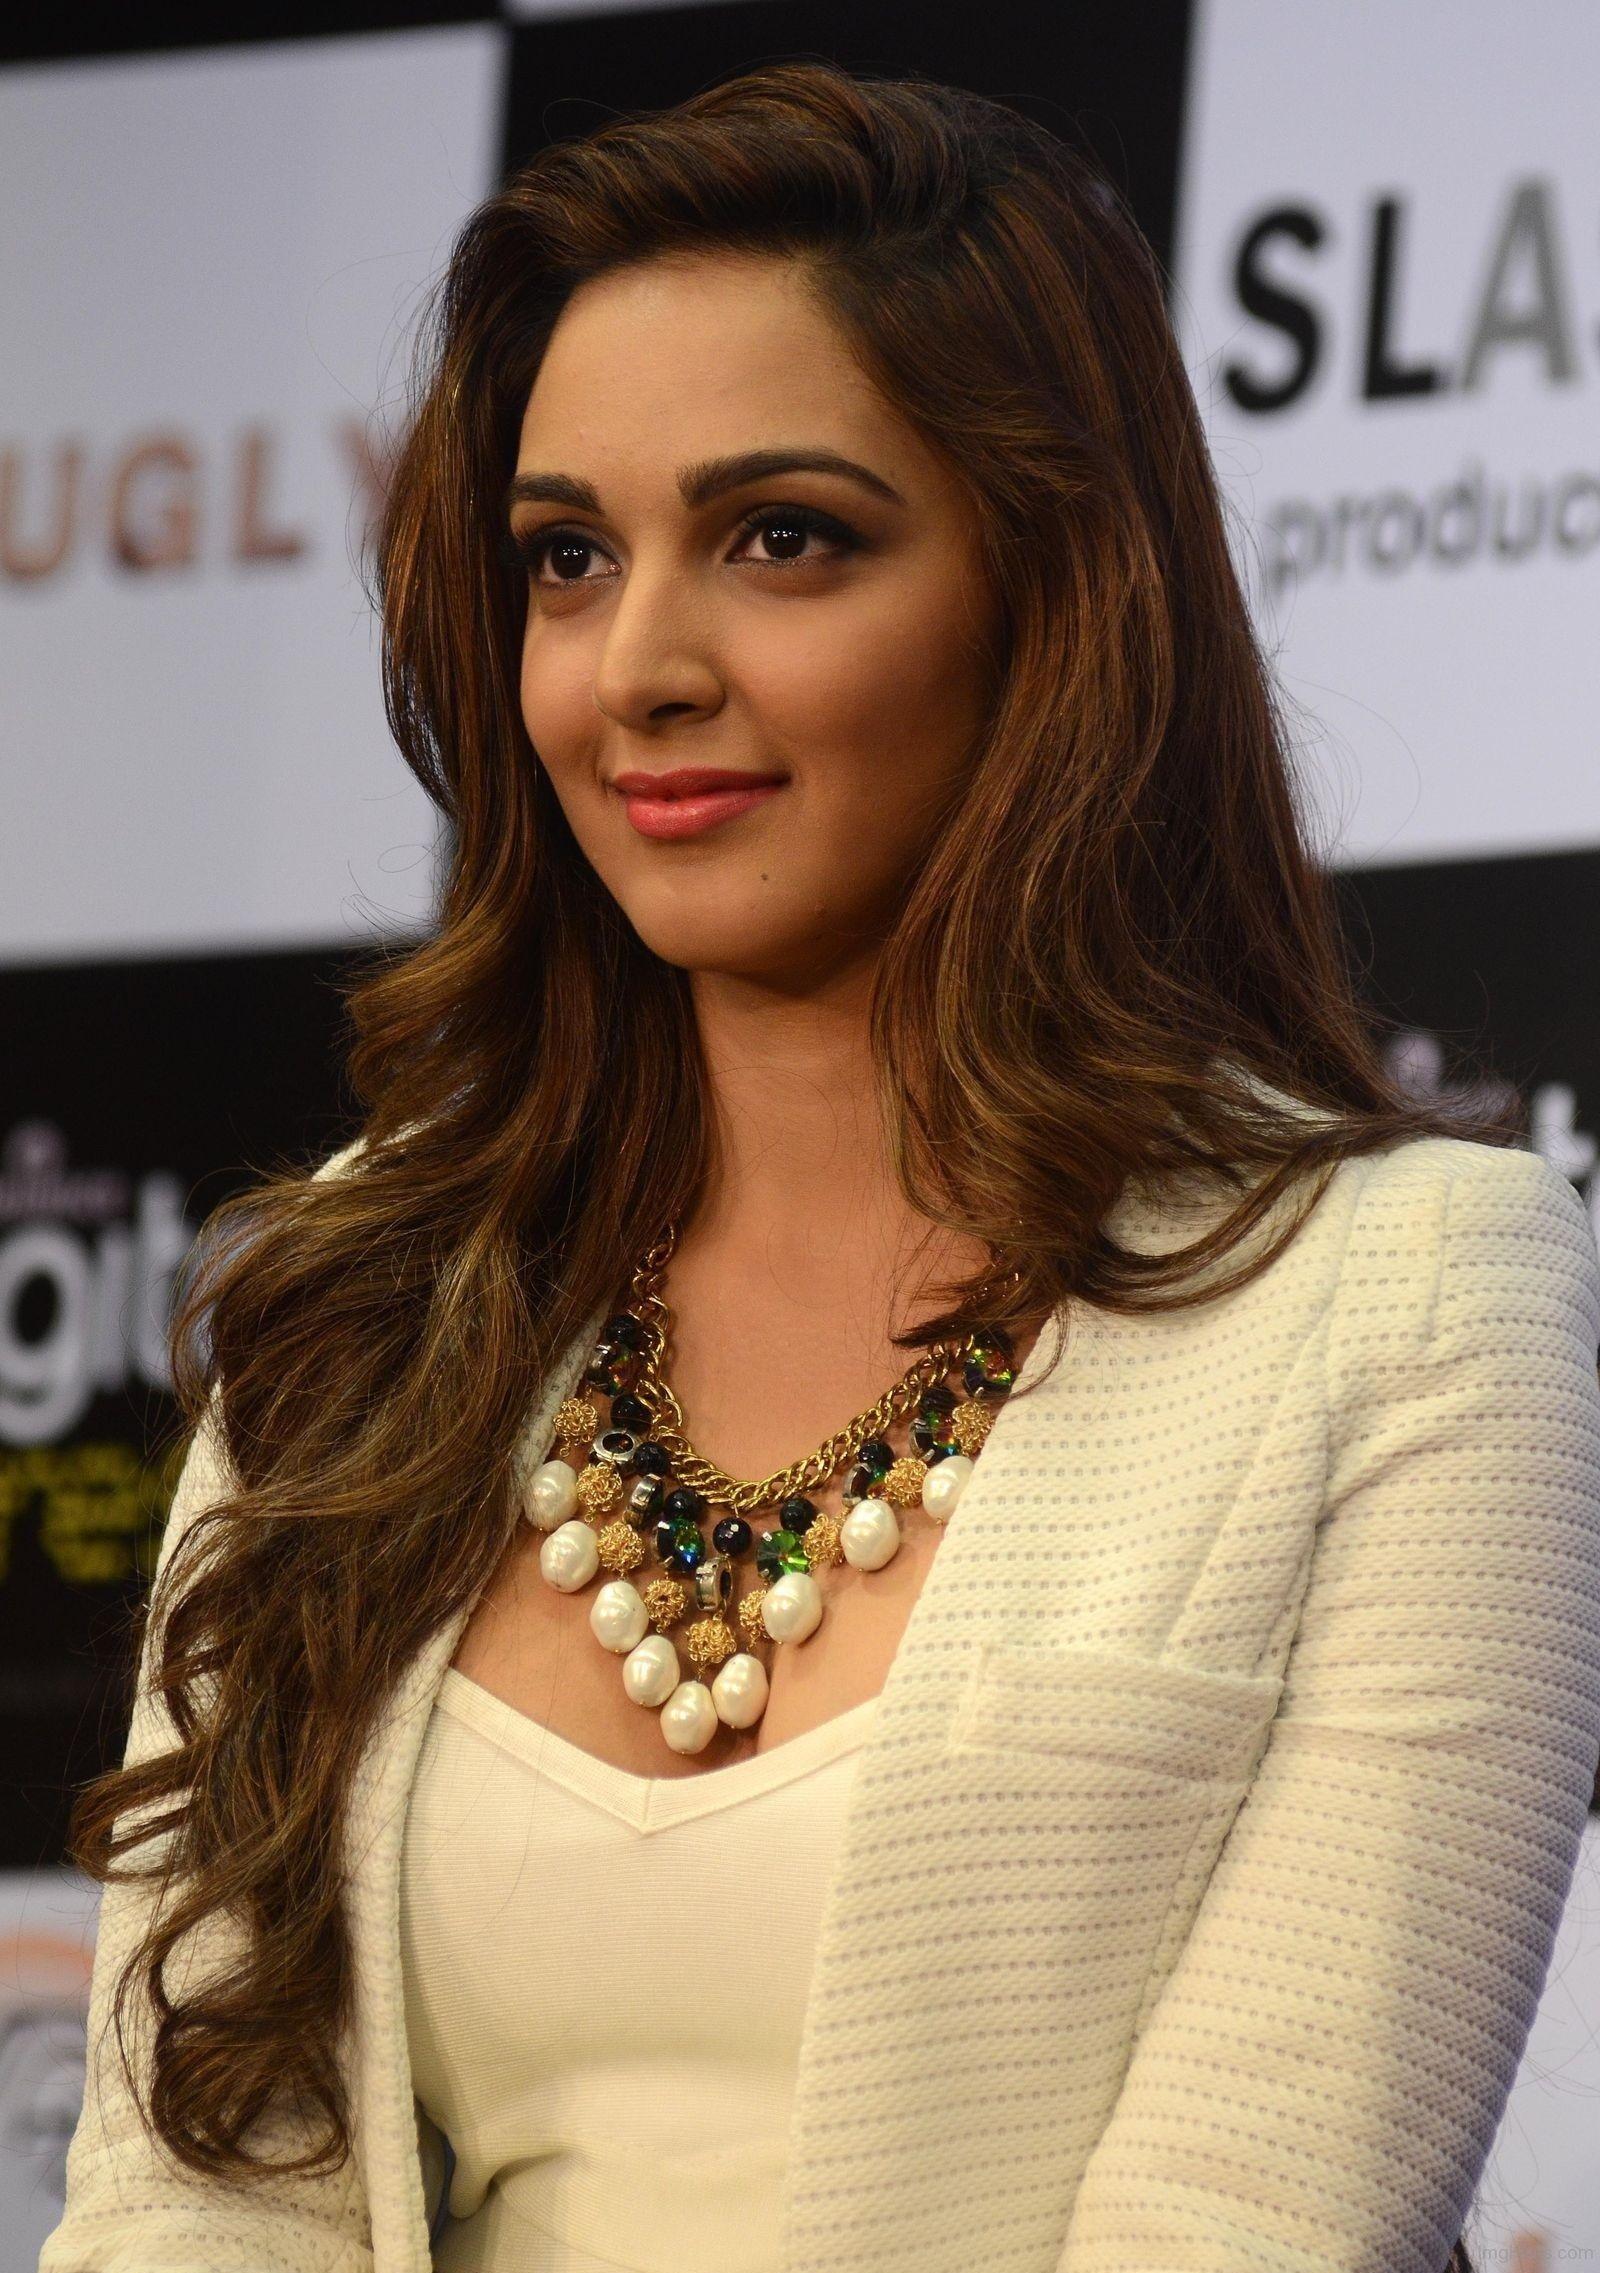 kiara-advani-looking-beautiful